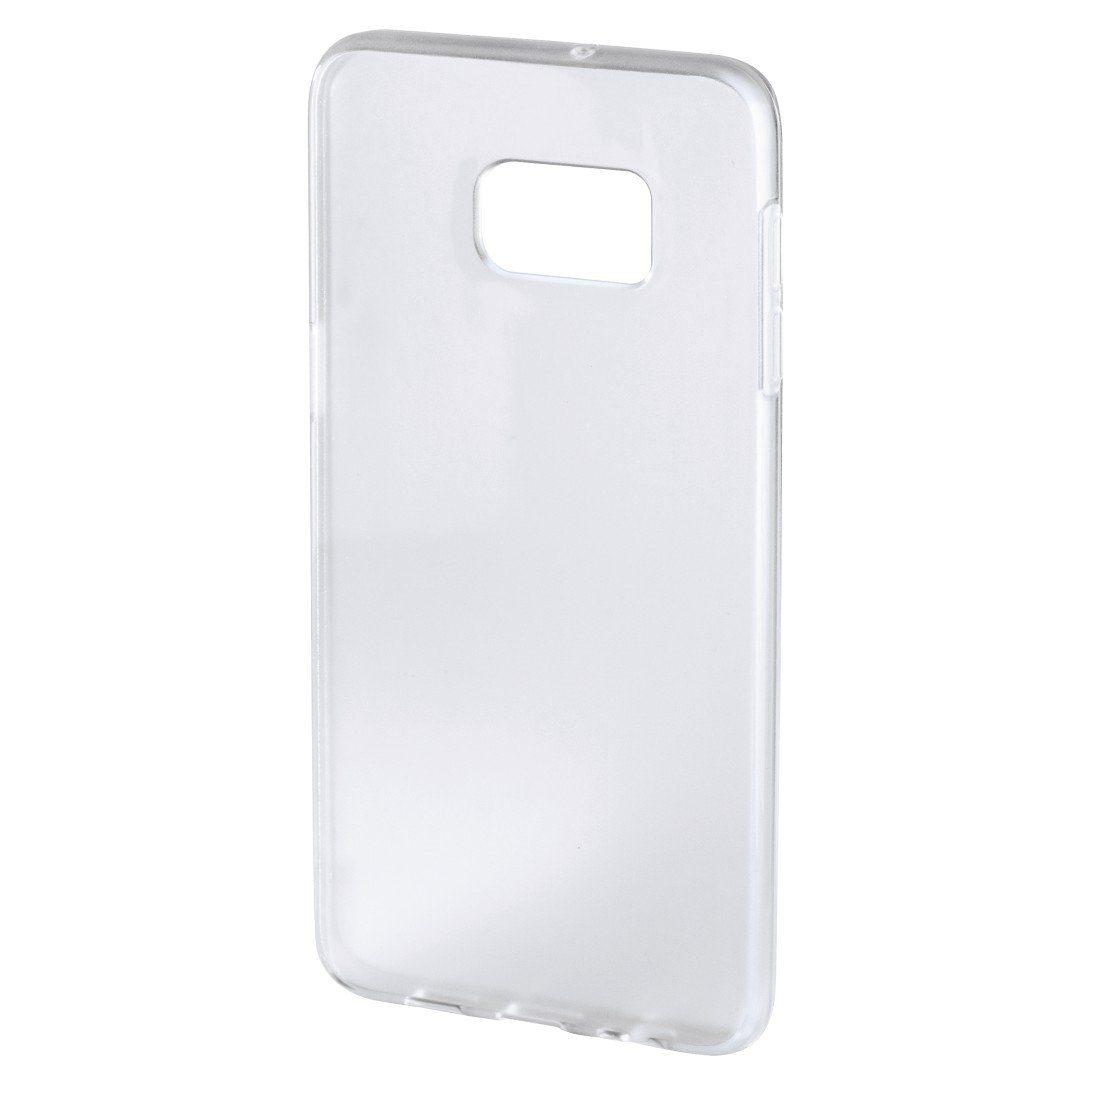 Hama Hülle für Samsung Galaxy S6 edge+ Schutzhülle Handyhülle »Handy Cover Case flexibles TPU«